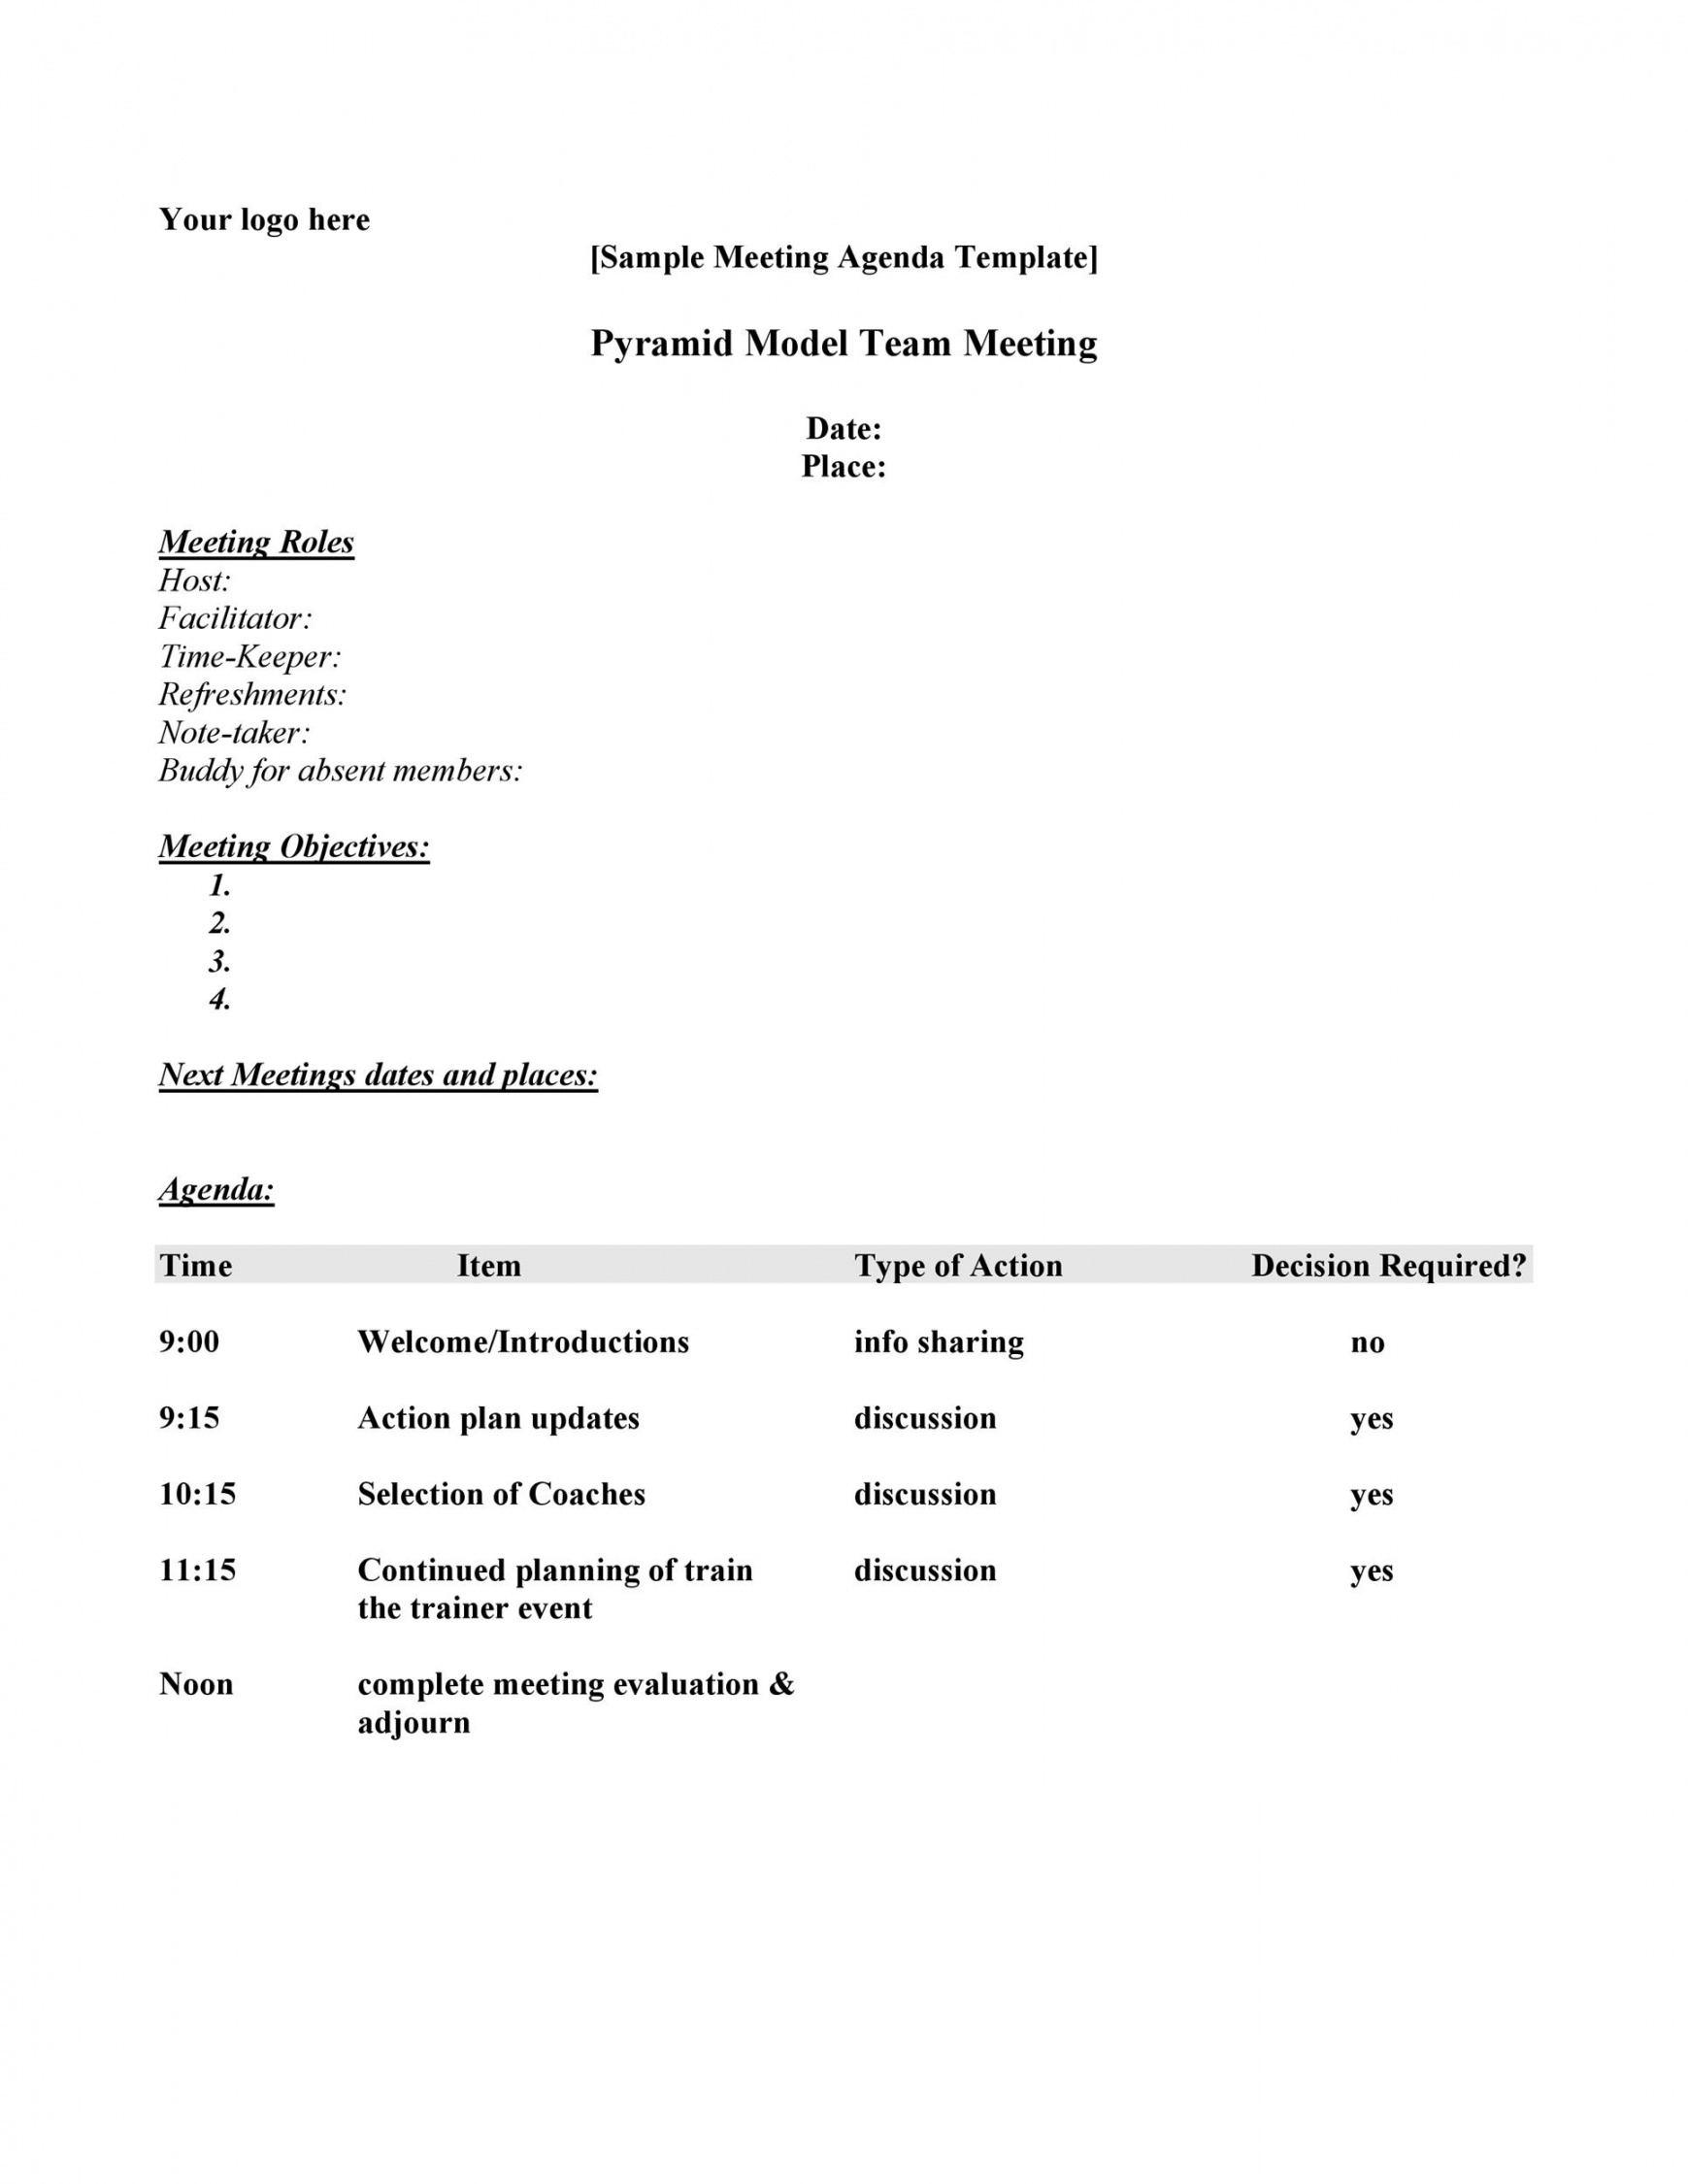 editable 46 effective meeting agenda templates ᐅ templatelab agenda for a meeting template excel